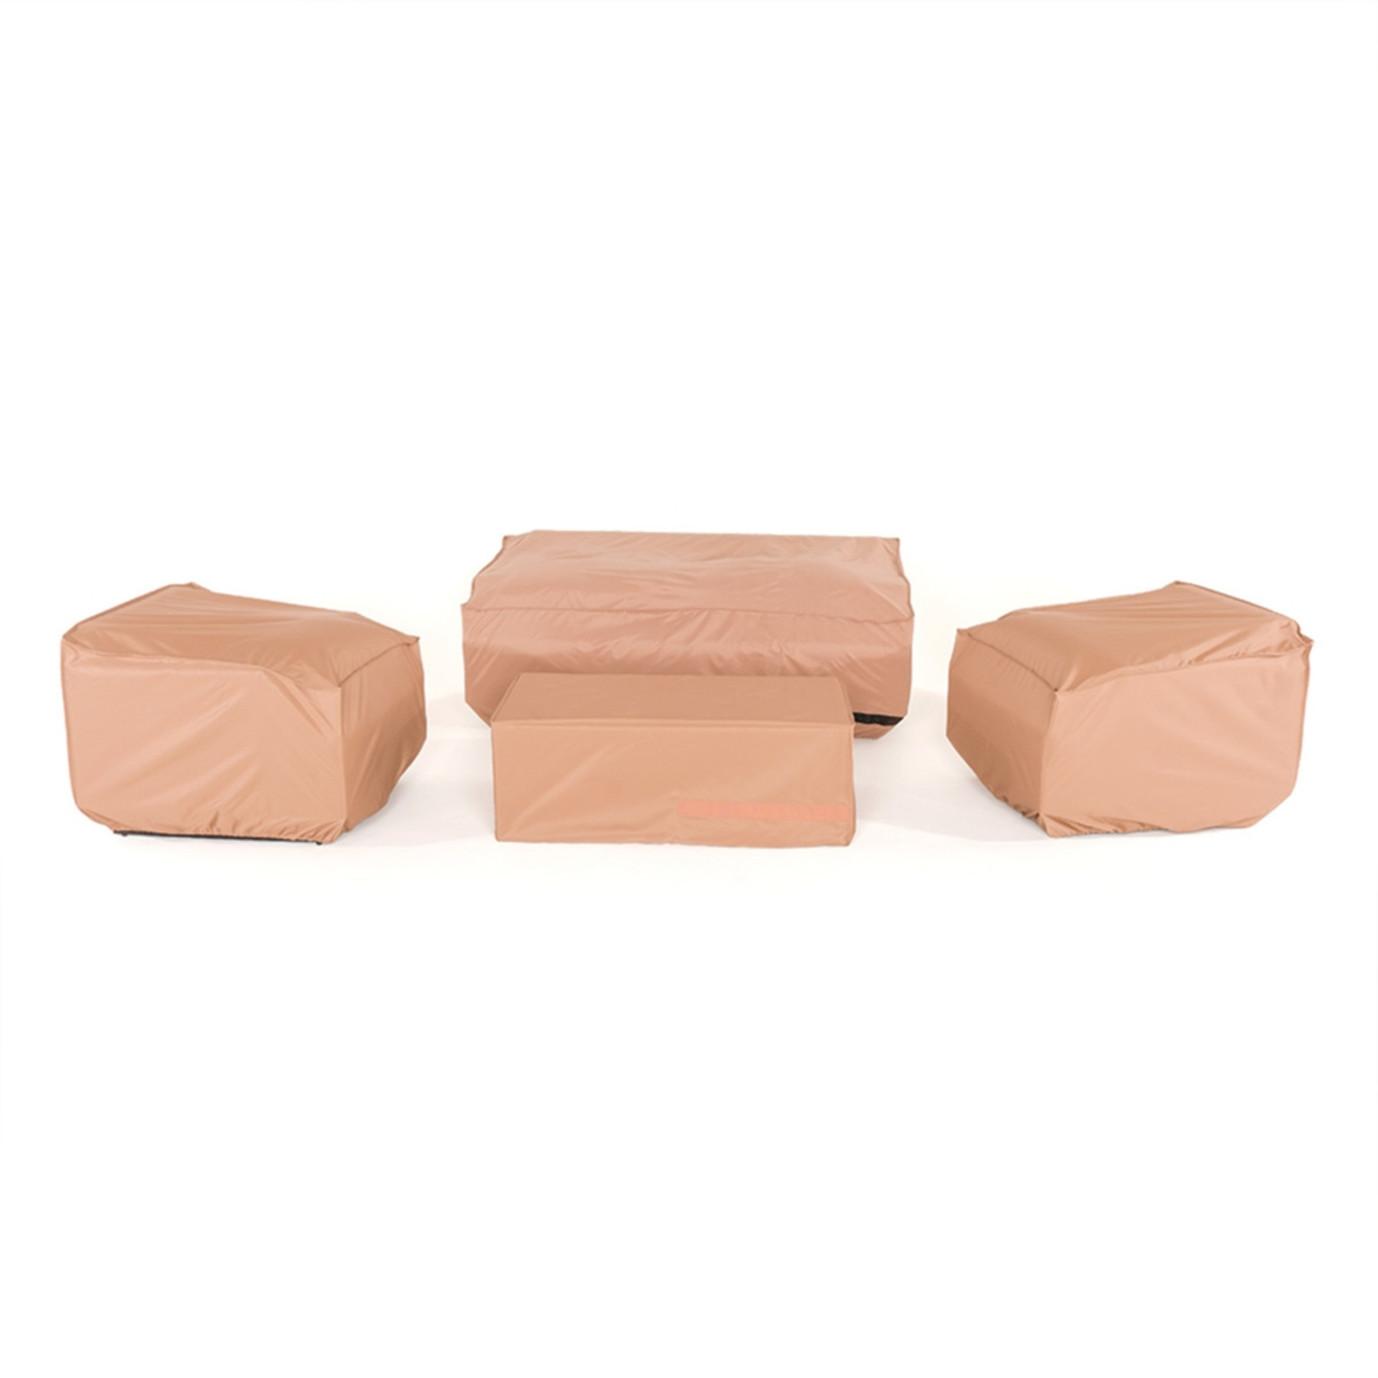 Milea/Mili 4pc Seating Storage Cover Set